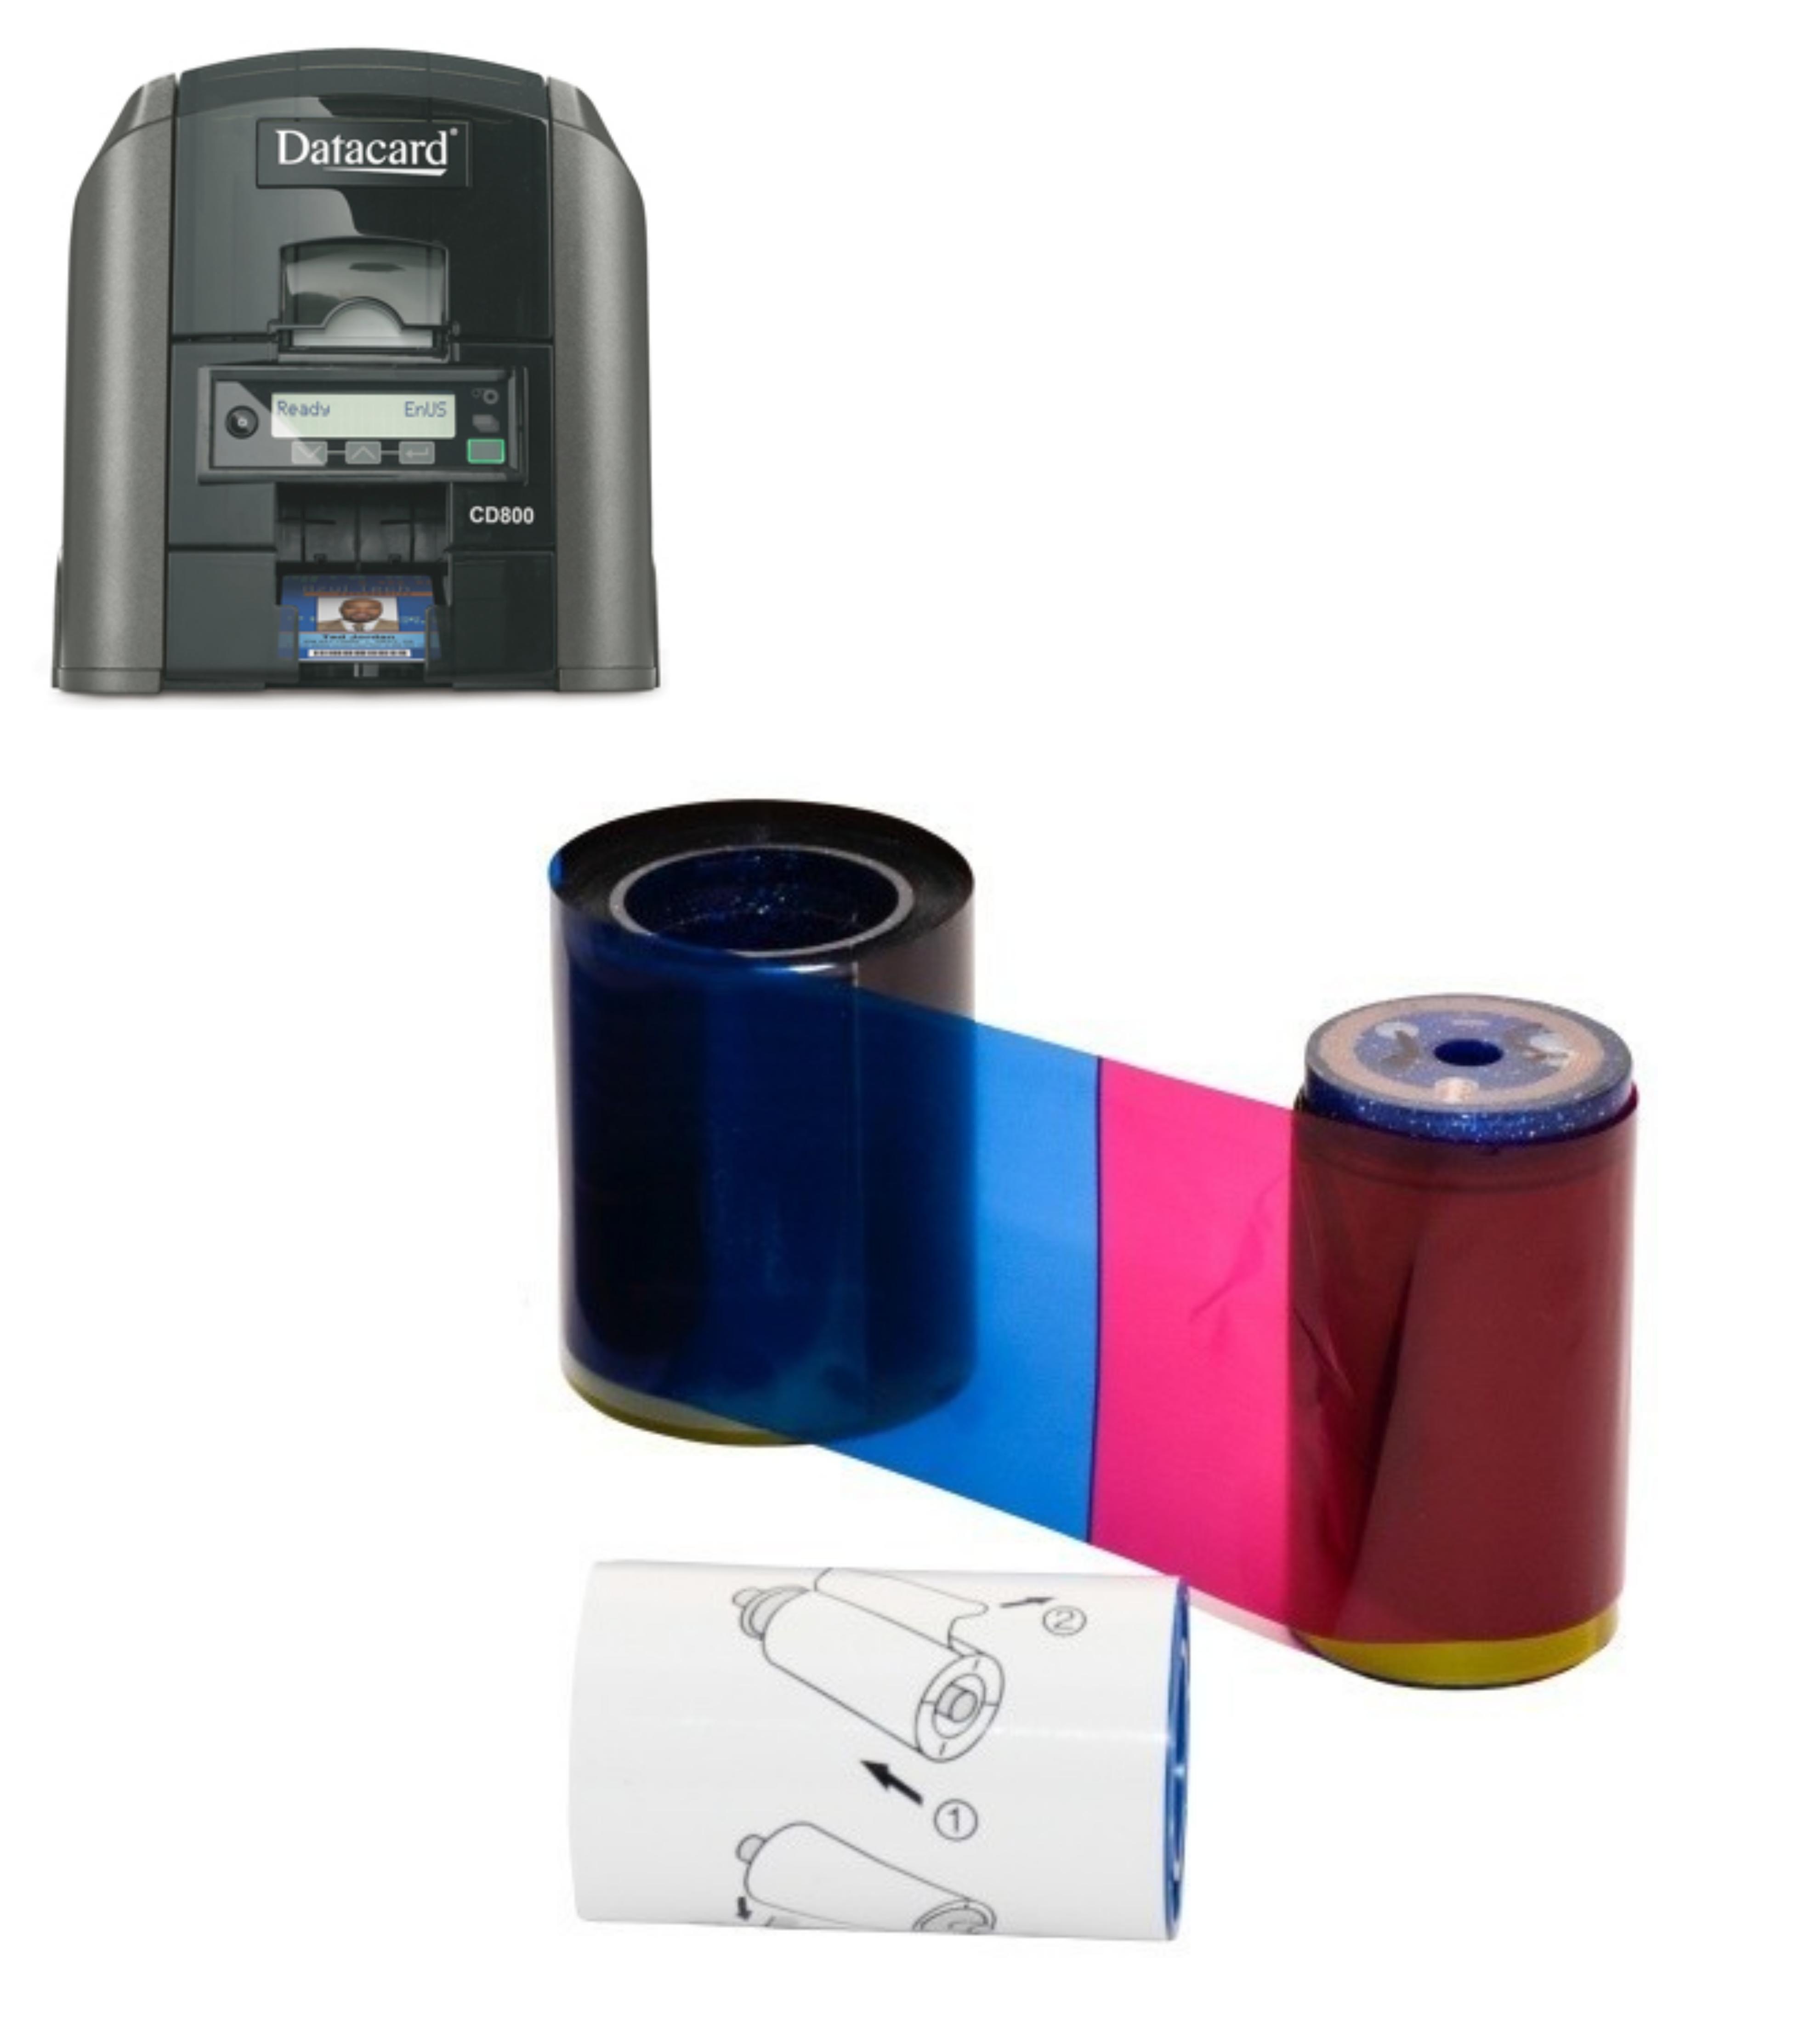 Rubans d'impression Datacard gamme CD et CP - Cardalis